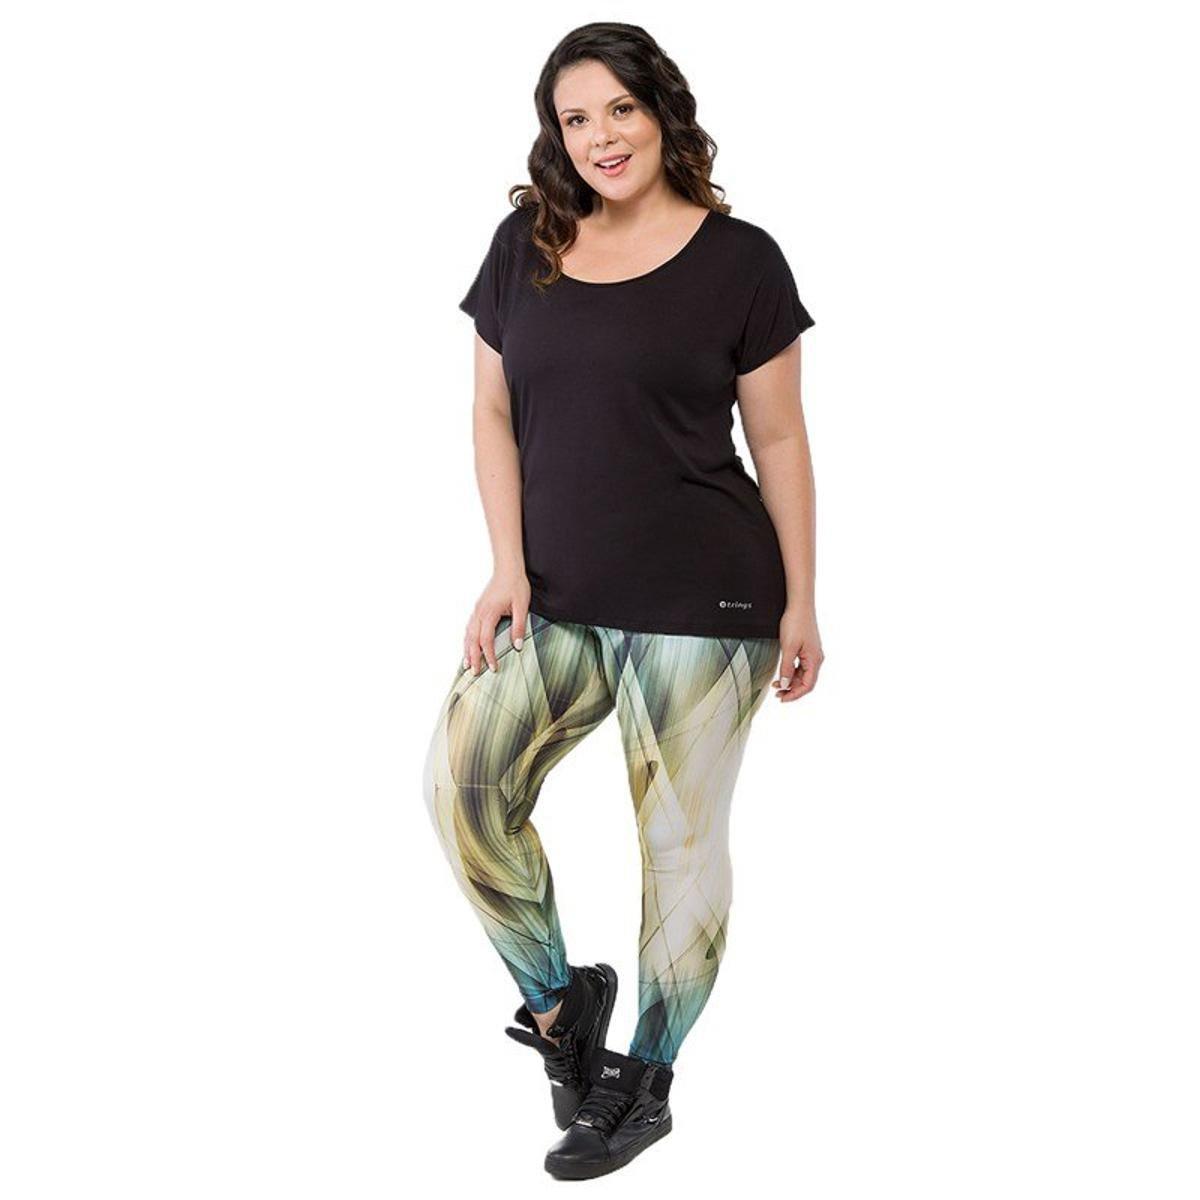 Size Calça nbsp;Trinys Candace Legging Plus Calça Size Plus Candace Verde Legging wqO7SH